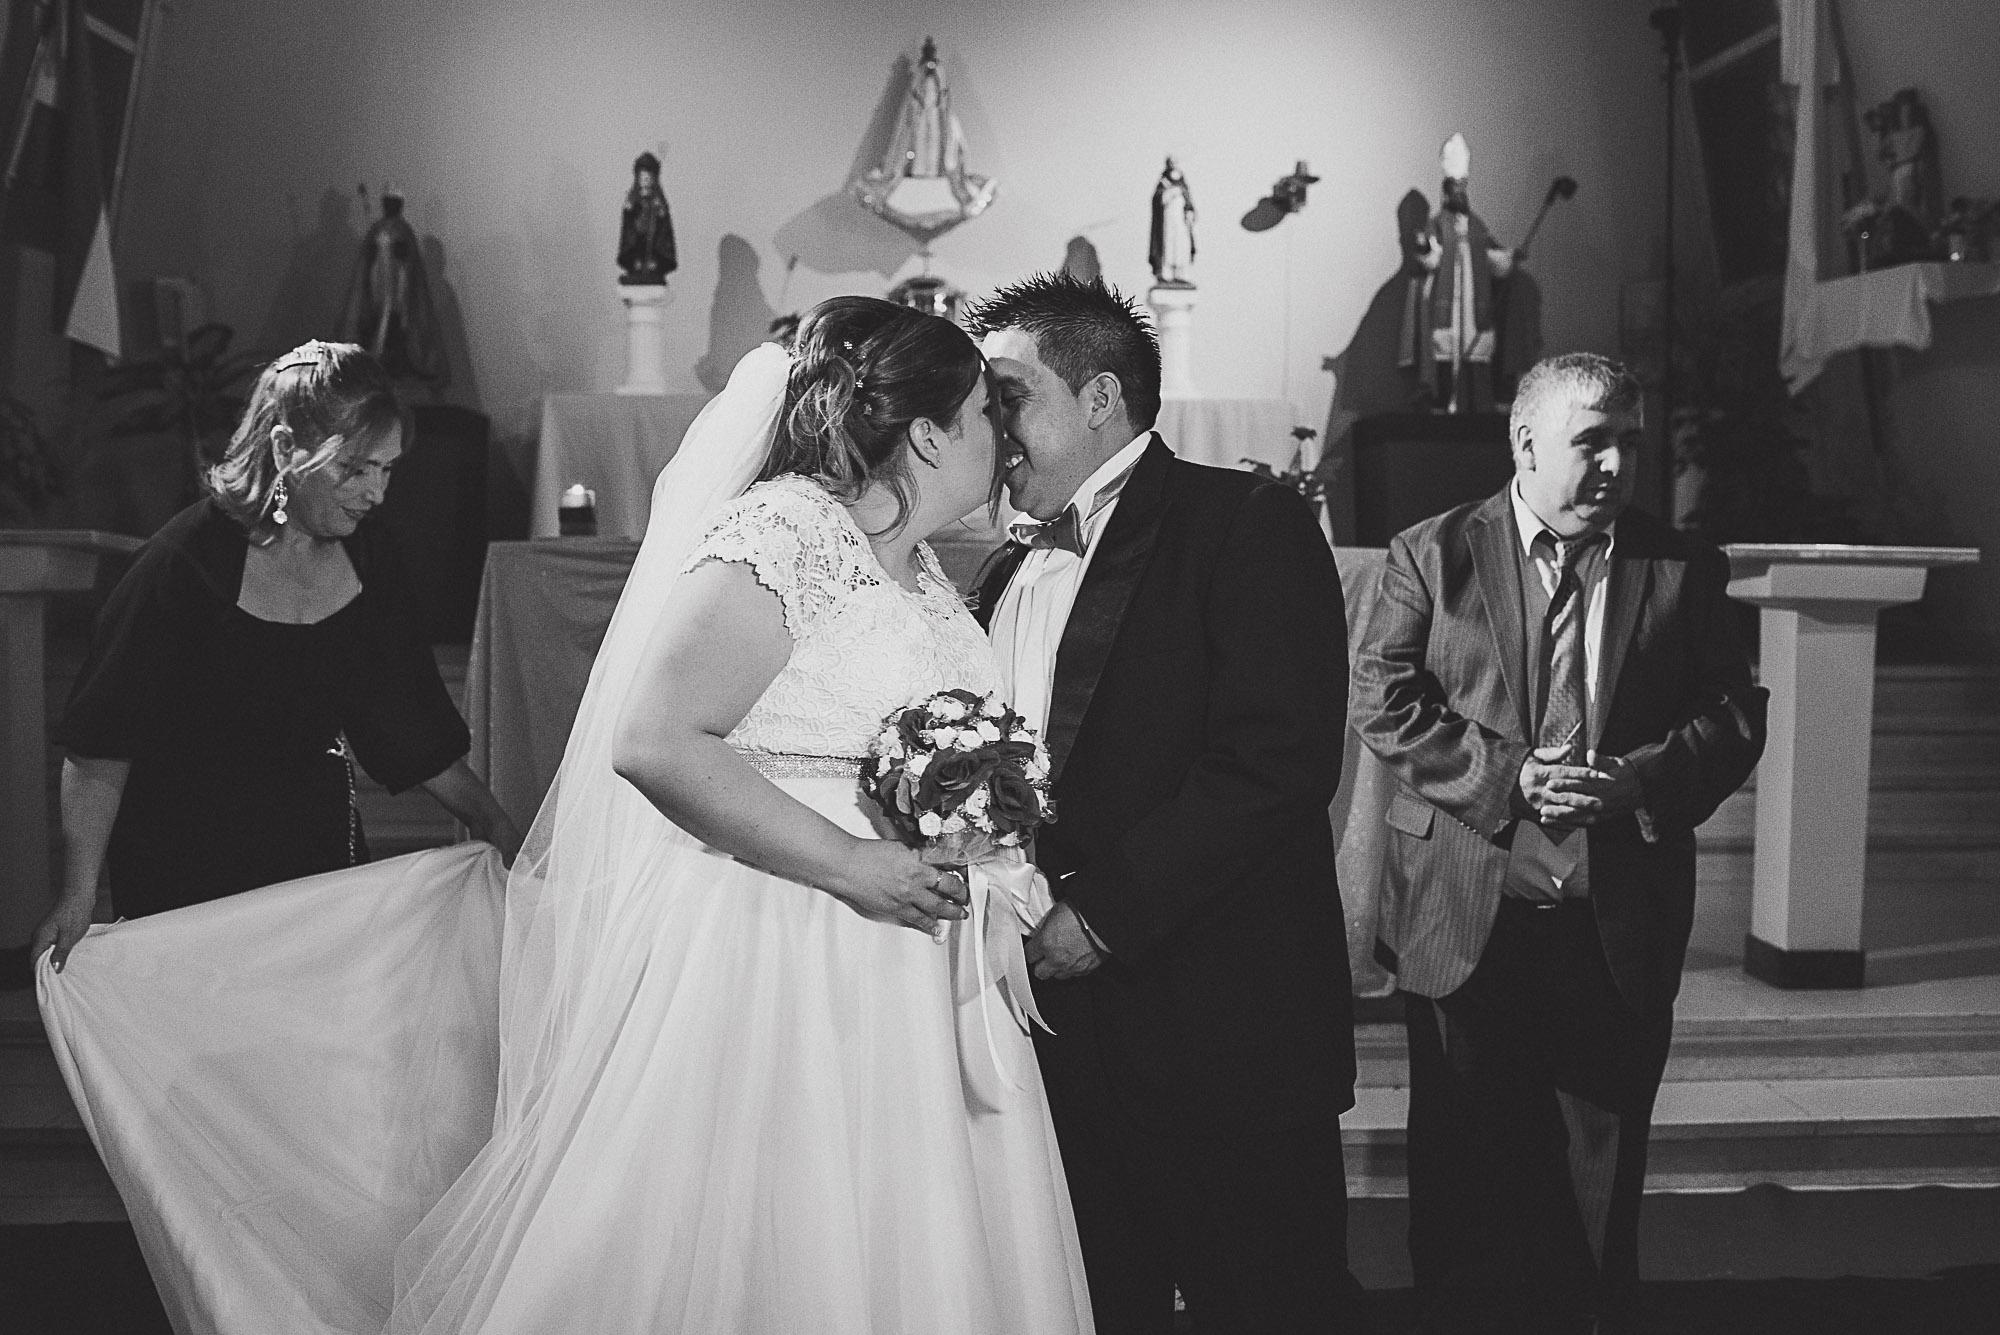 boda-vero-raul-patagonia-argentina-chilena-fotografo-de-bodas-argentina-casamiento-en-patagonia-gabriel-roa-photography-16